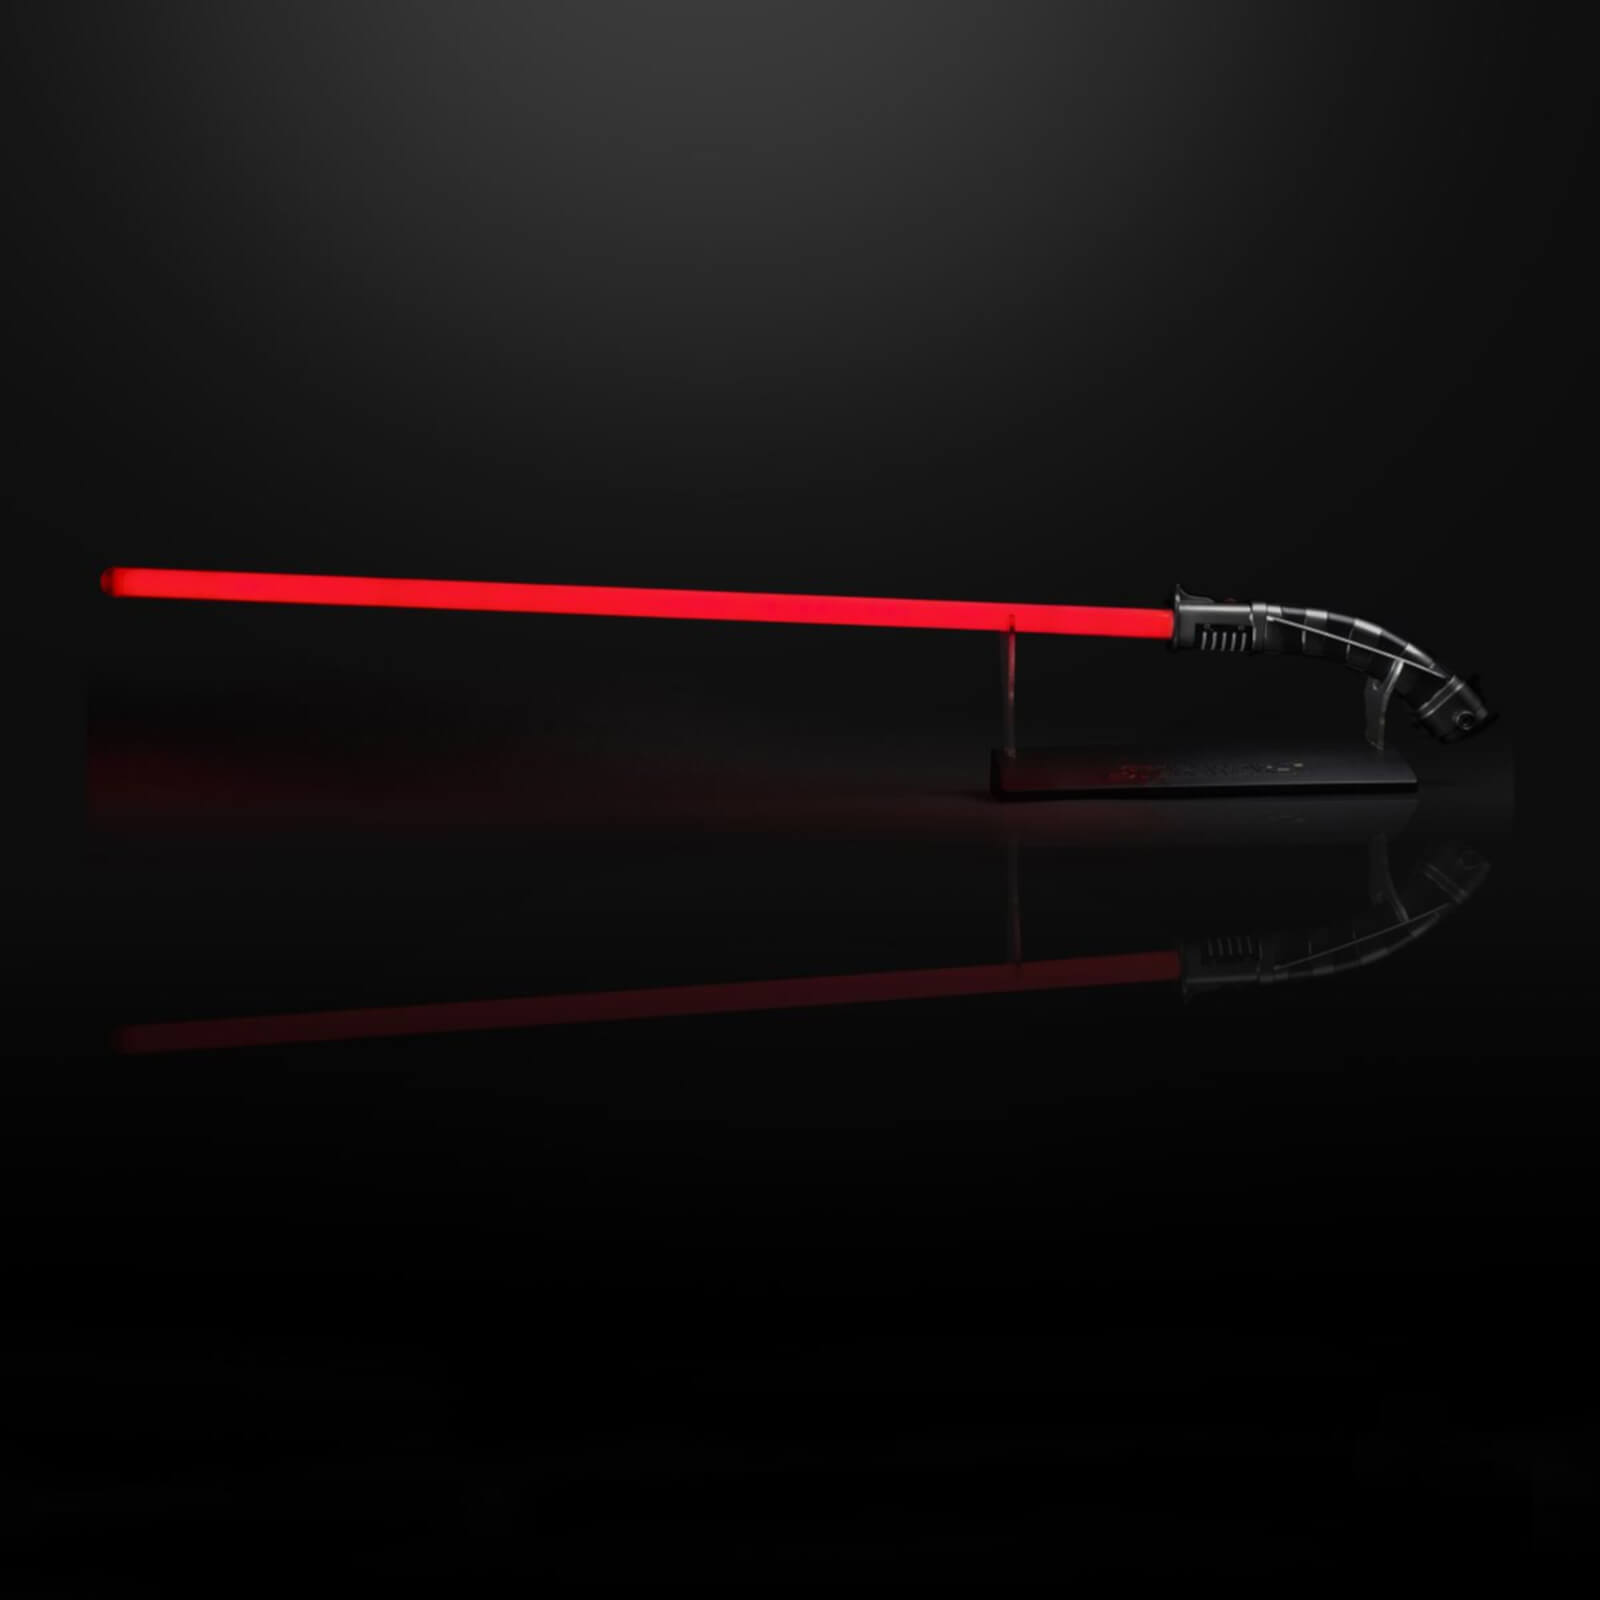 Image of Hasbro Star Wars The Black Series Asajj Ventress Force FX Lightsaber